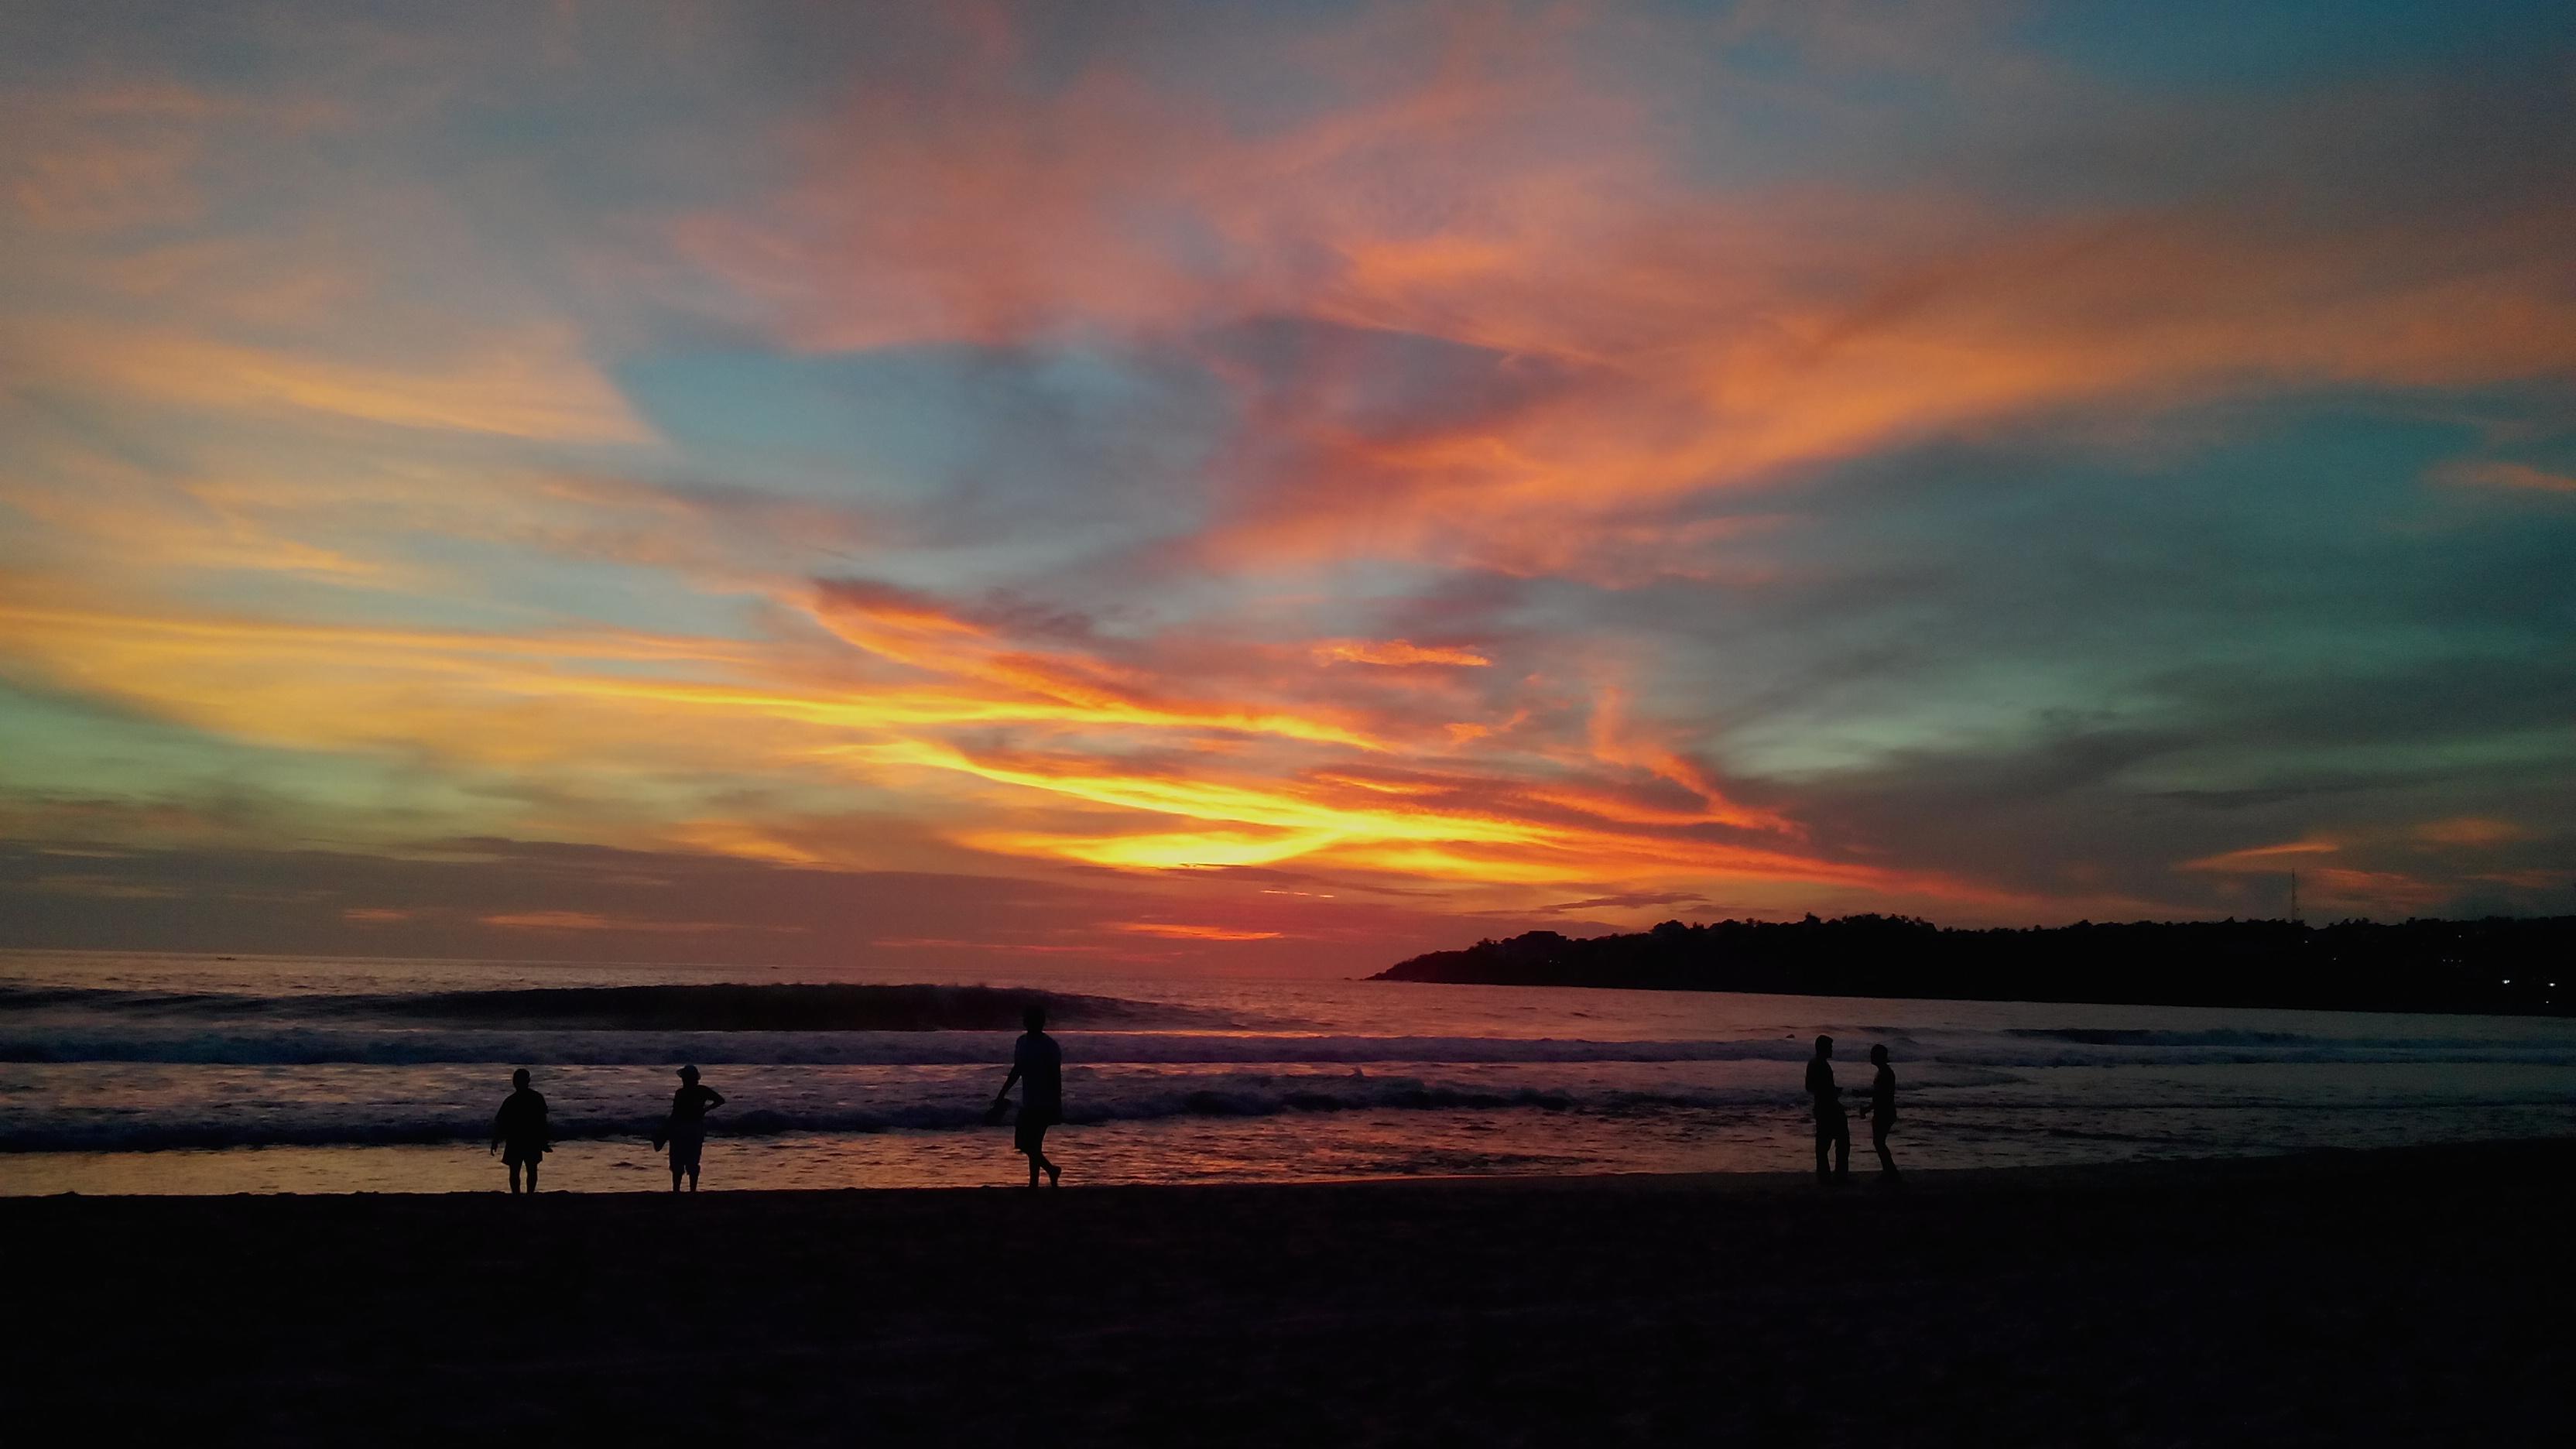 #Nuestro México: Atardecer en playa Zicatela